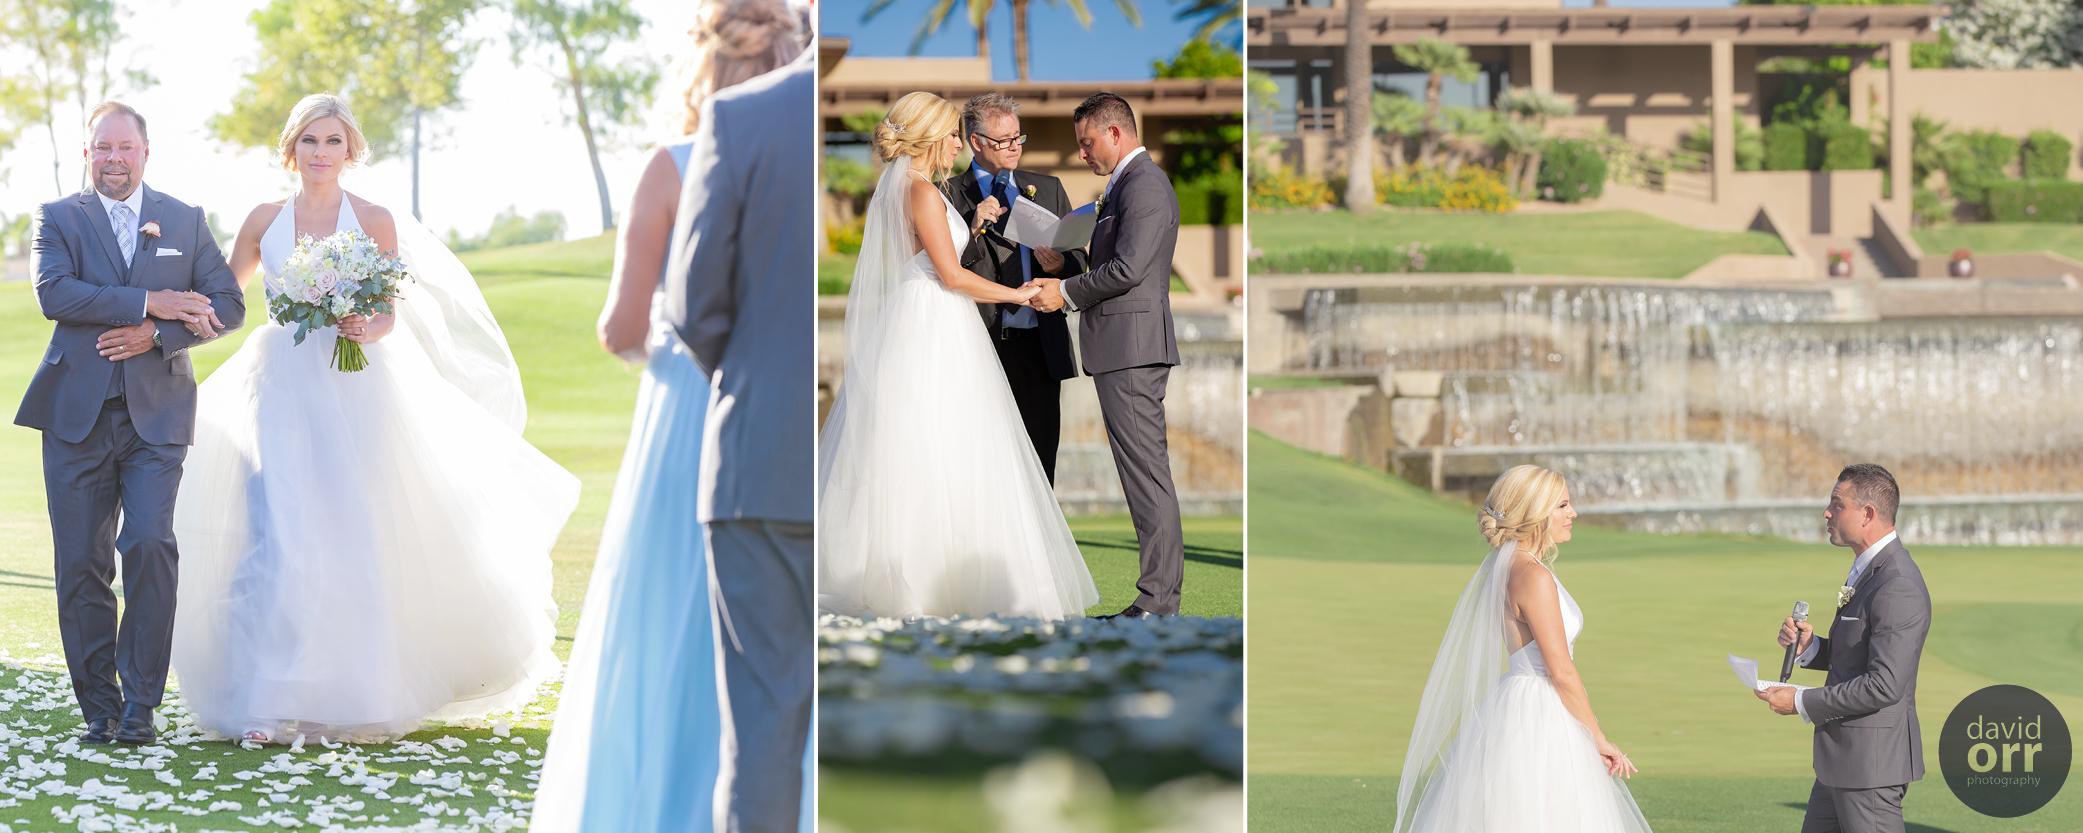 DavidOrrPhotography_Gainey-Ranch-Golf-Club-Wedding-Ceremony.jpg